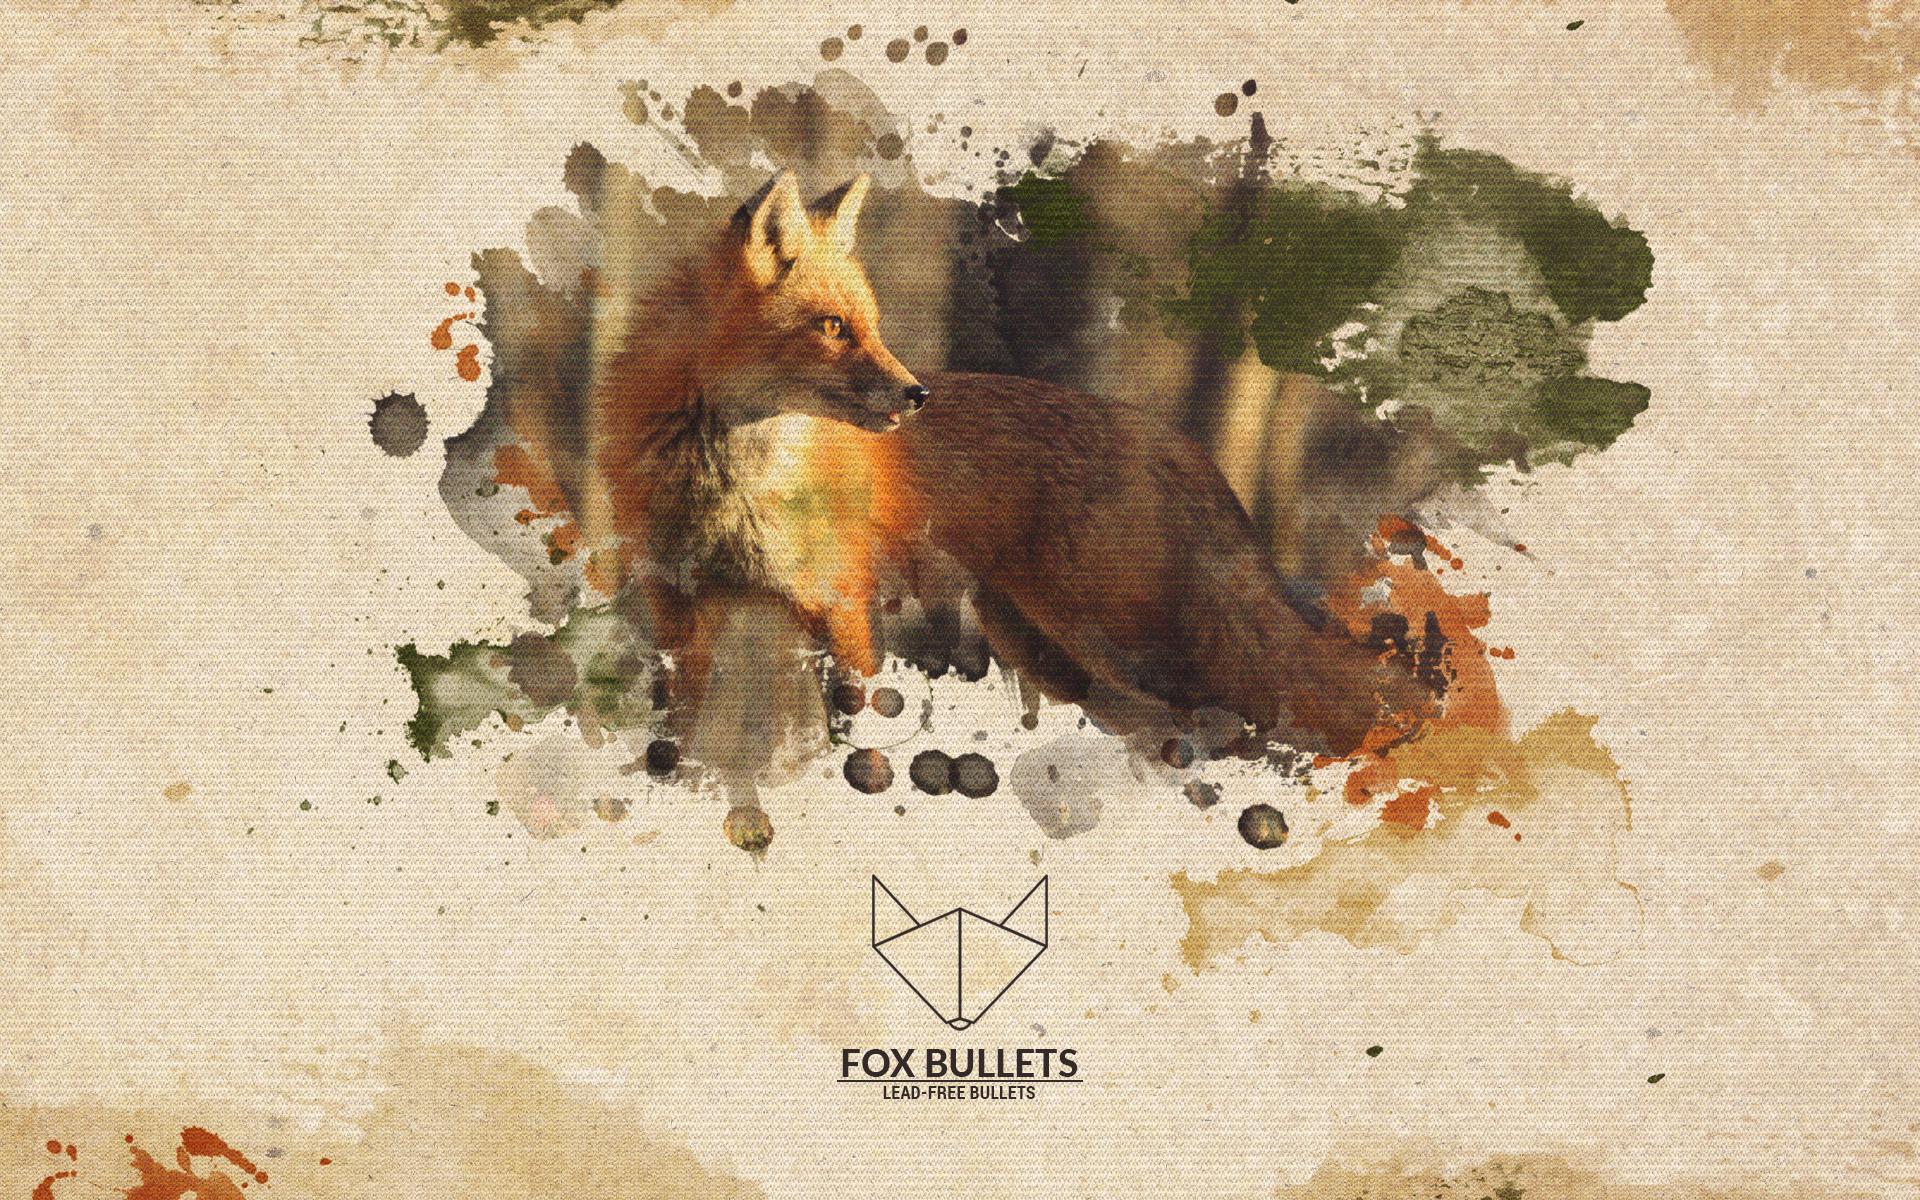 Fox Bullets_background_fox